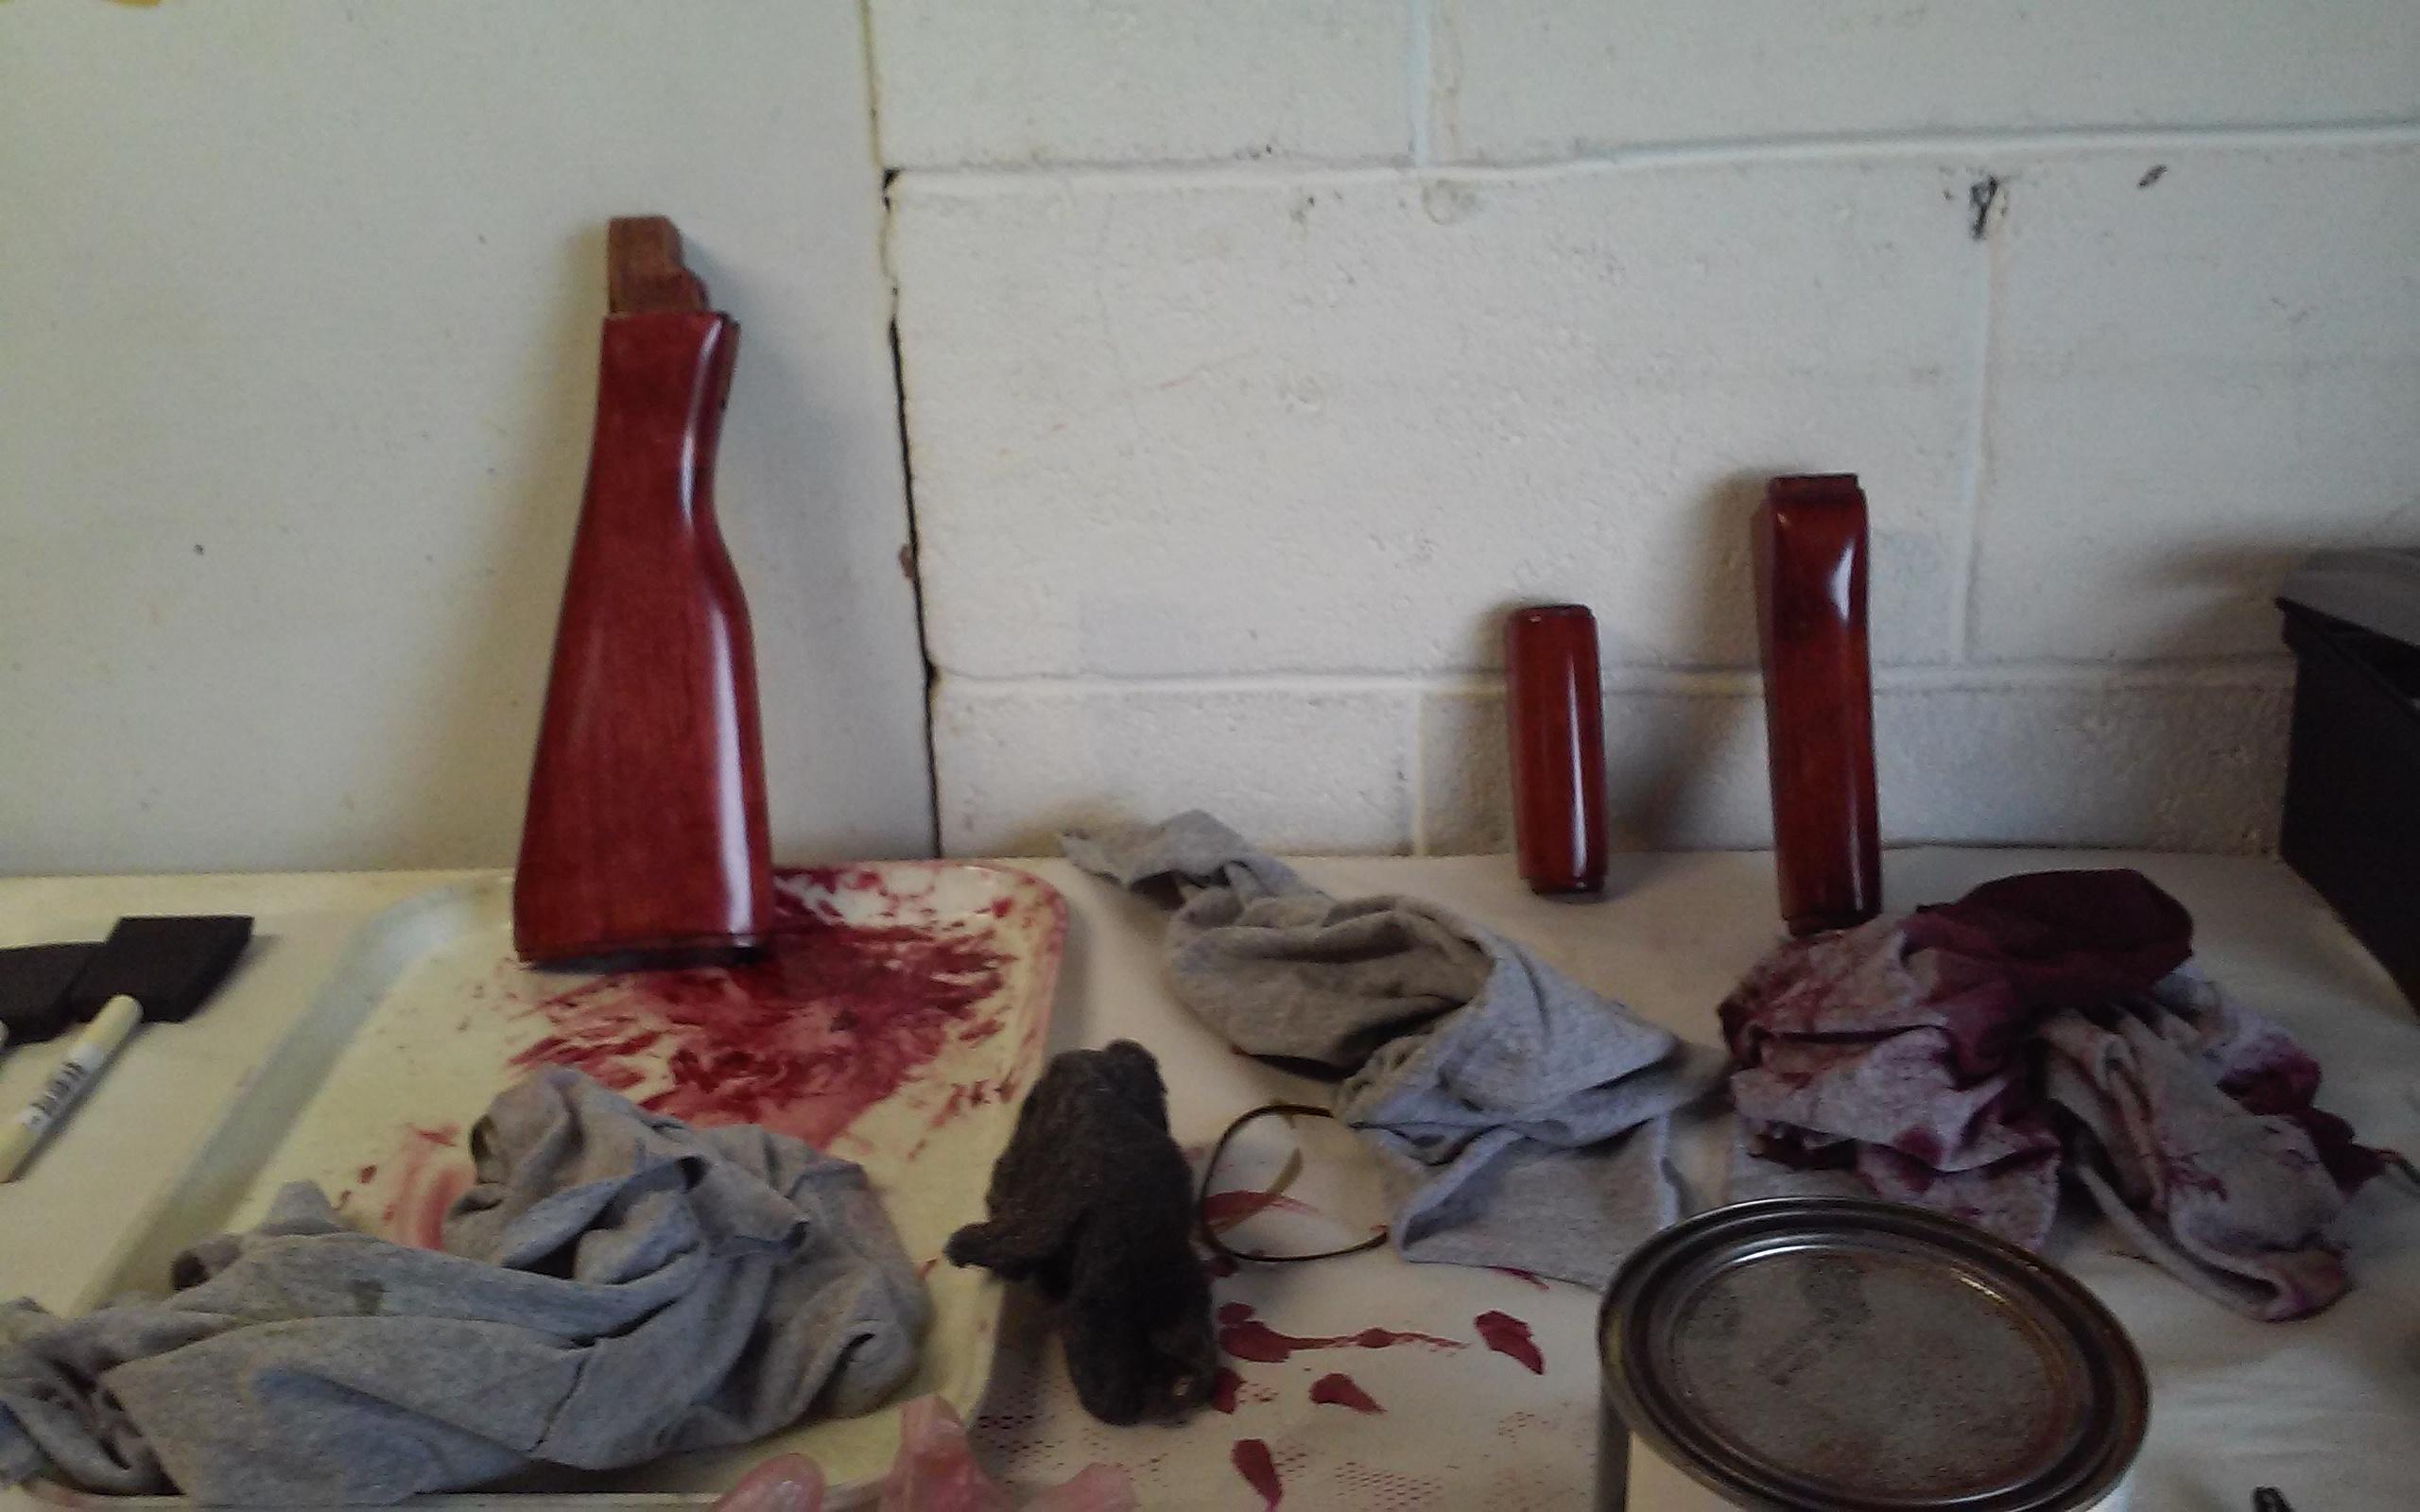 AK furniture Refinish